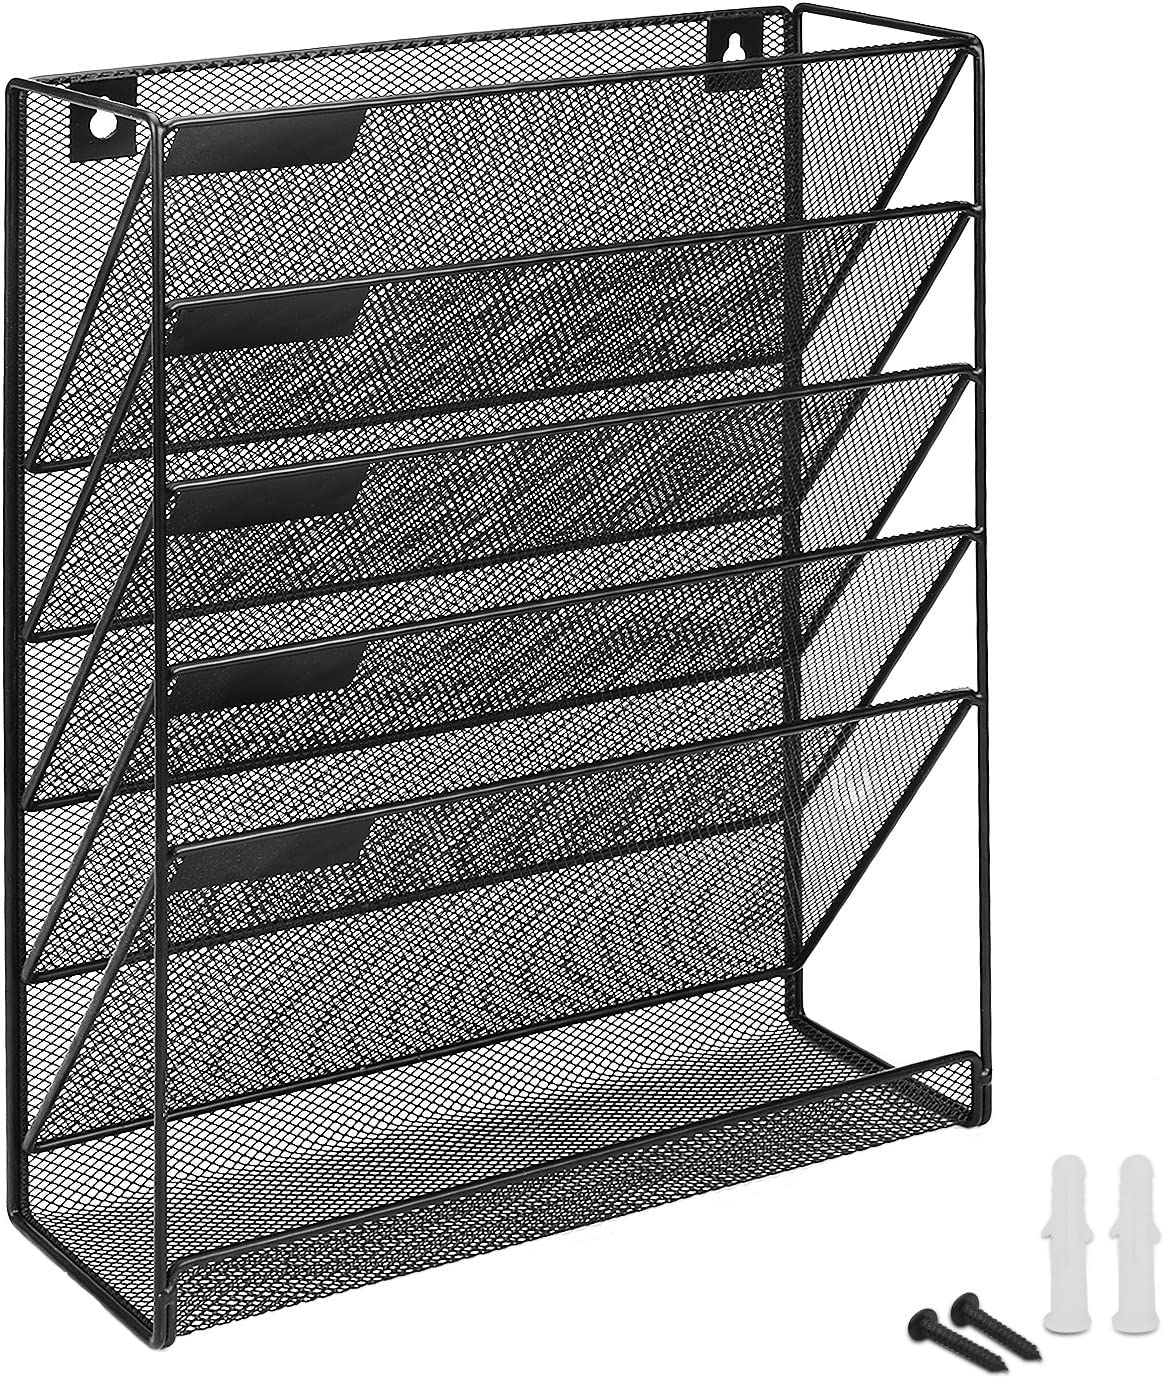 Metal Magazine Newspaper Book Rack Basket Wall Mounted Post Letter Pamphlet Home